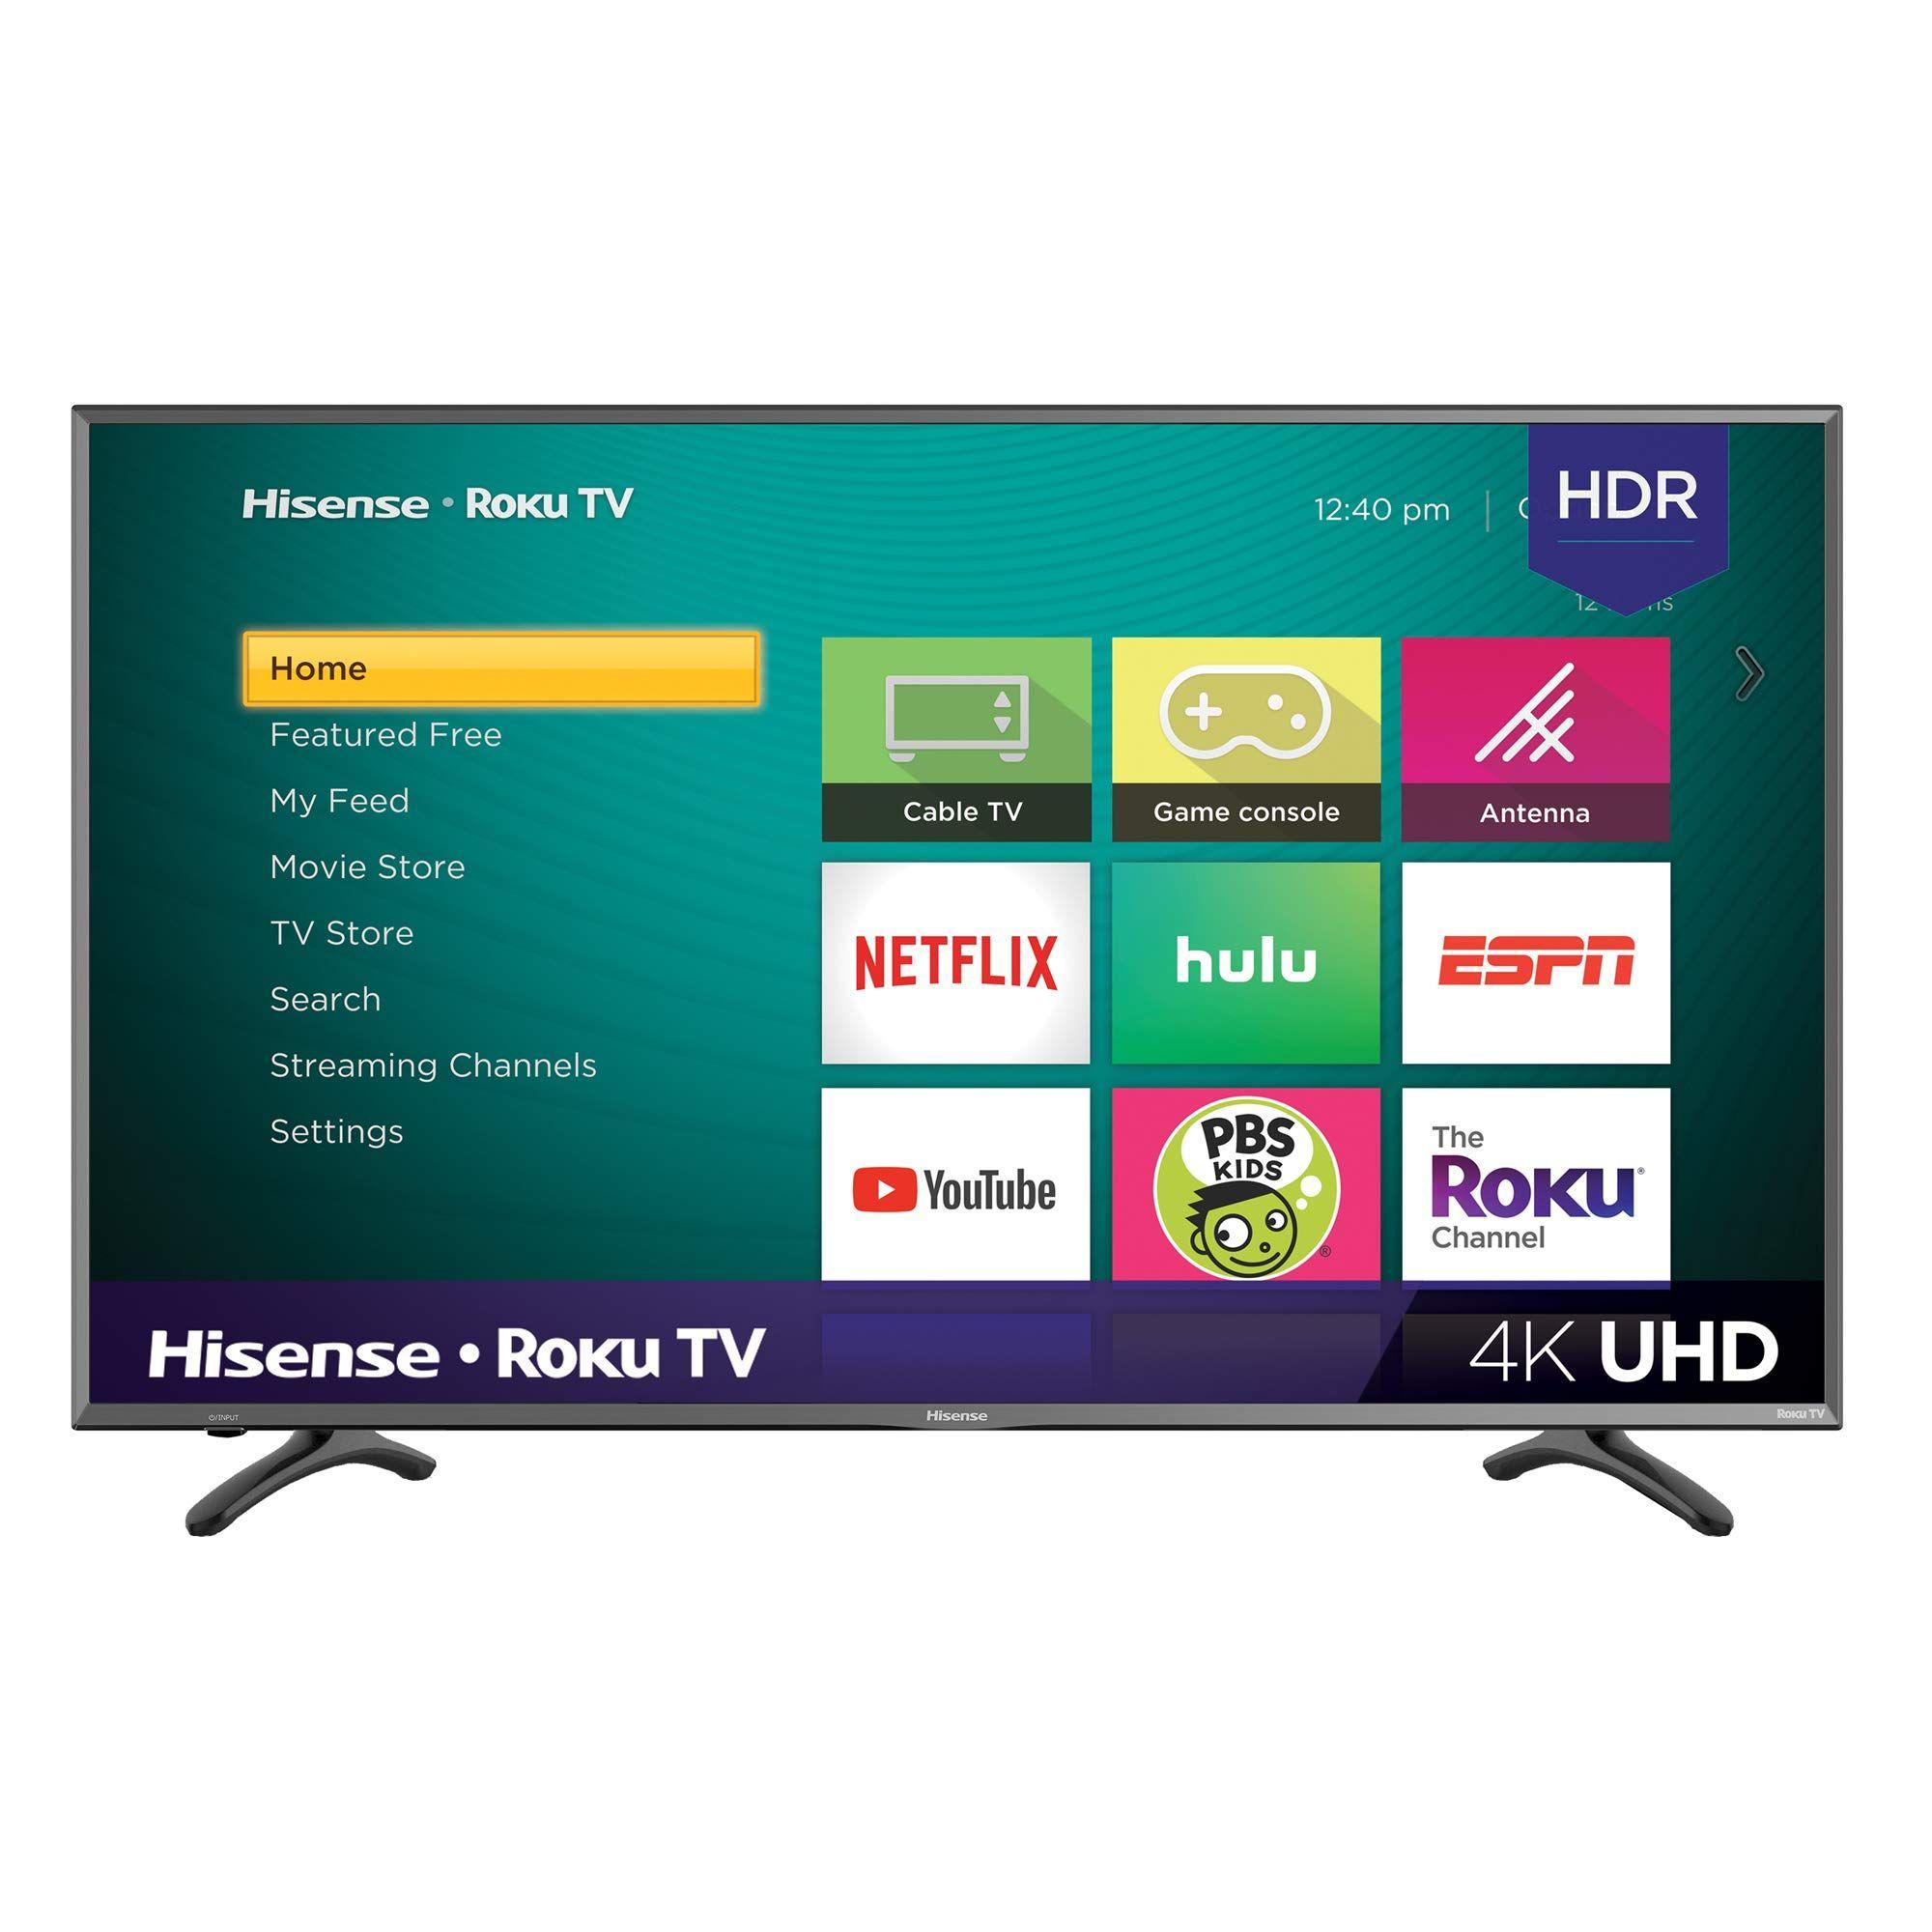 Hisense 50r7e 50 Inch 4k Ultra Hd Roku Smart Led Tv Hdr 2019 Smart Tv 4k Tv Roku